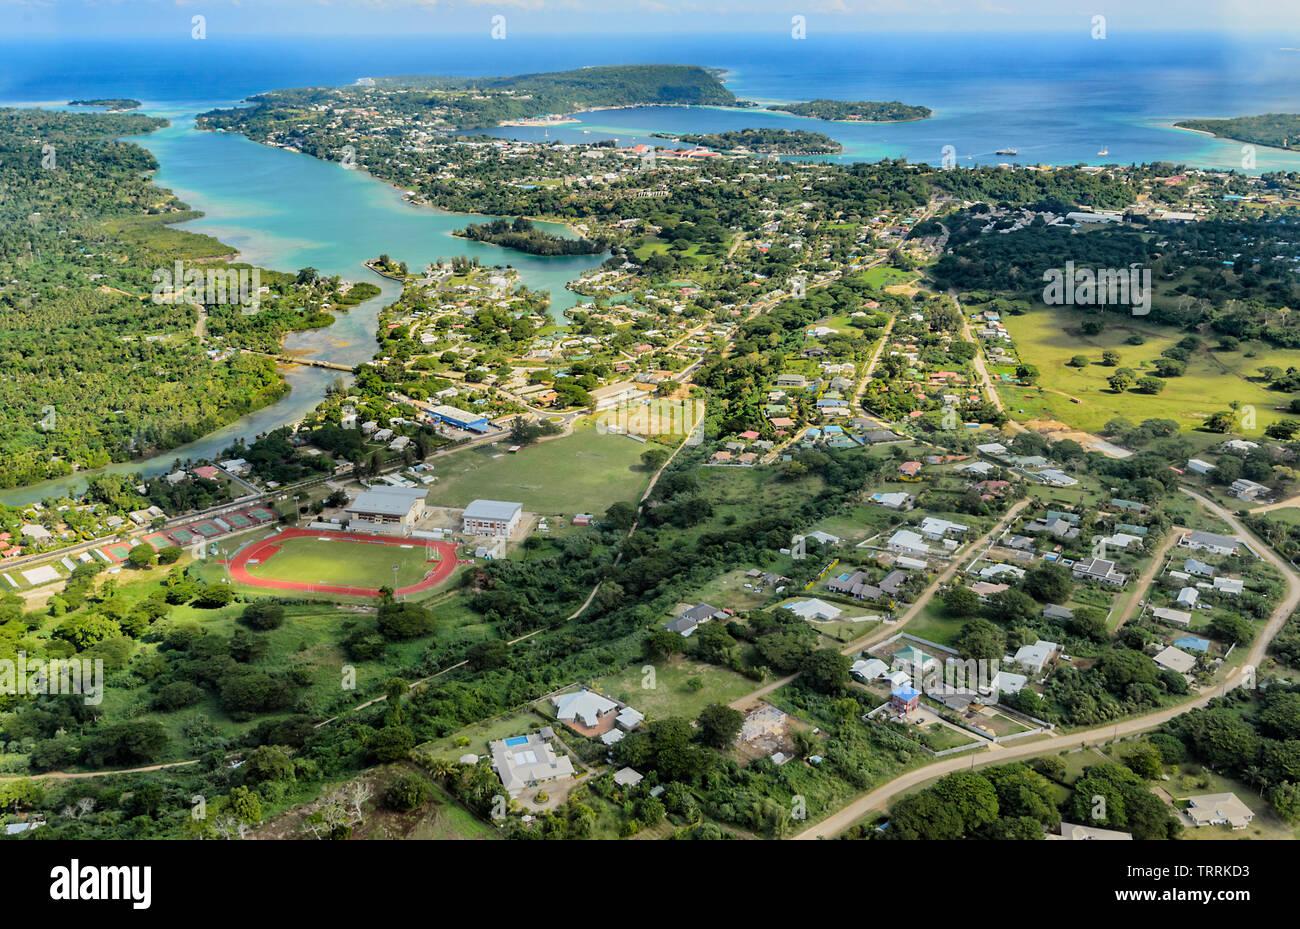 Scenic aerial view of Port Vila, Efate Island, Vanuatu, Melanesia - Stock Image